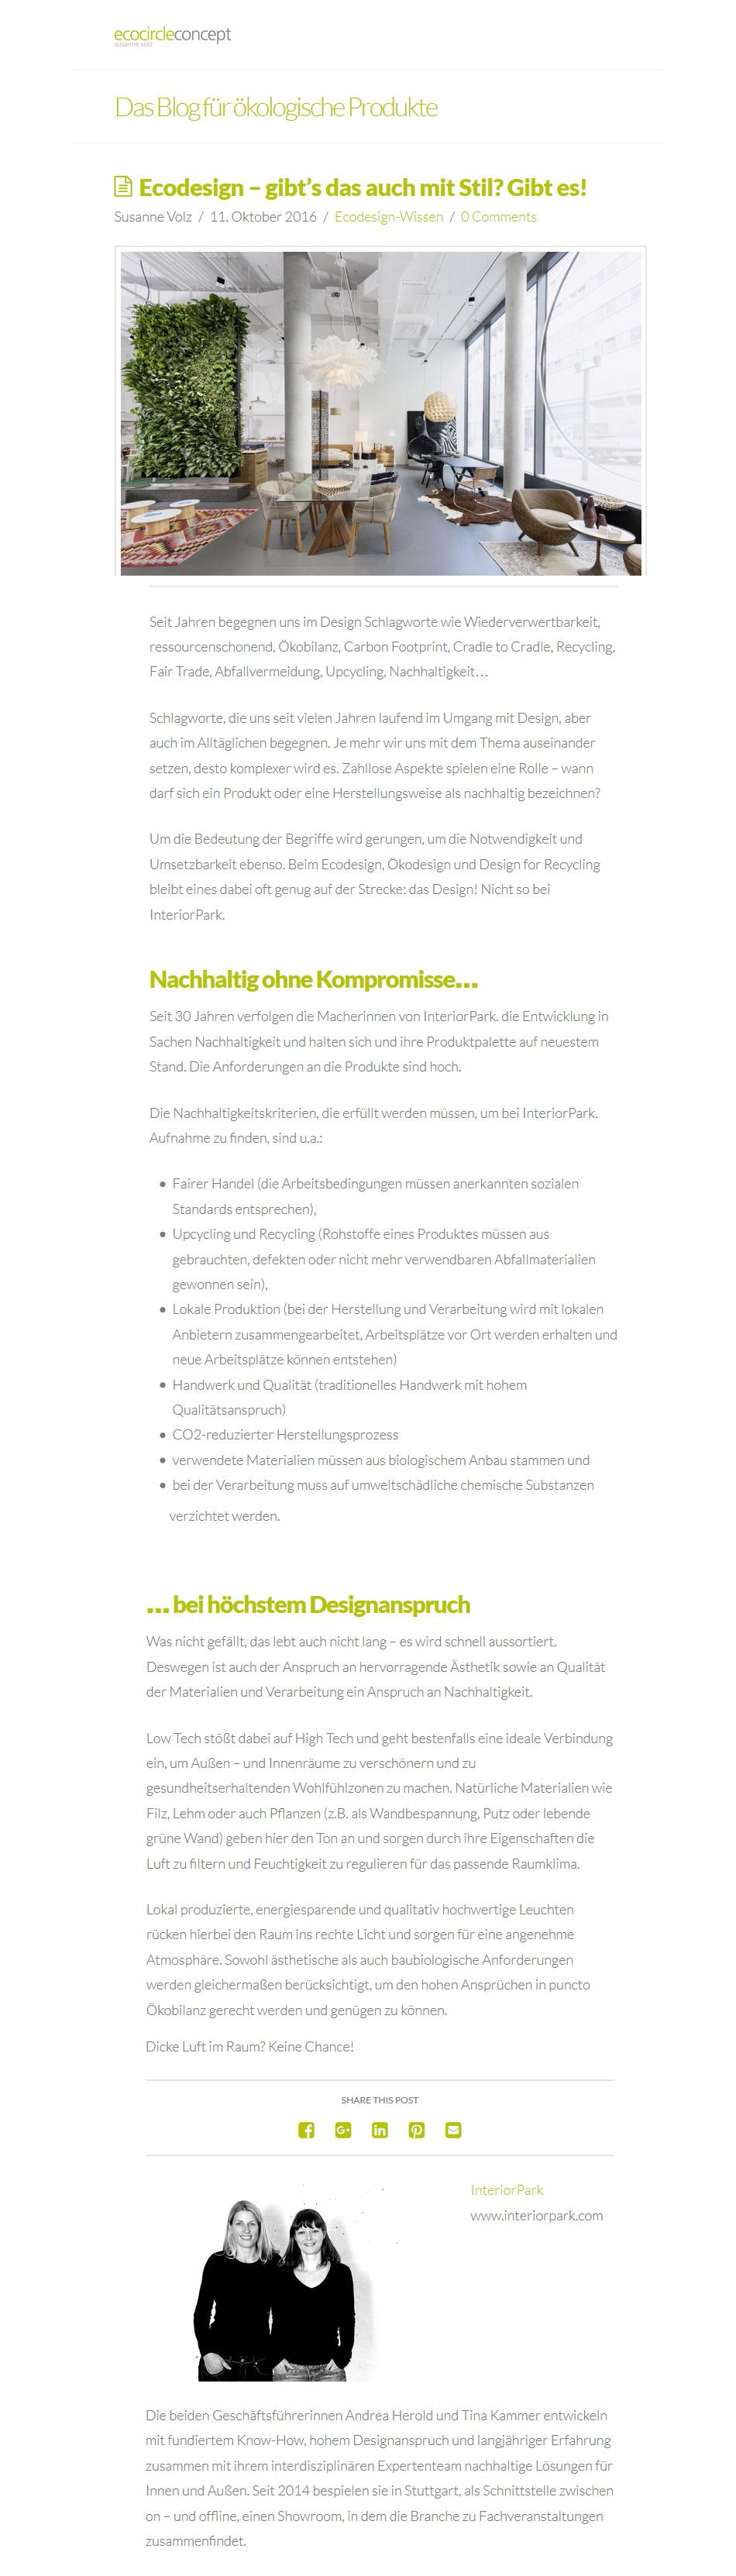 ecocircle Blogartikel über InterioPark.